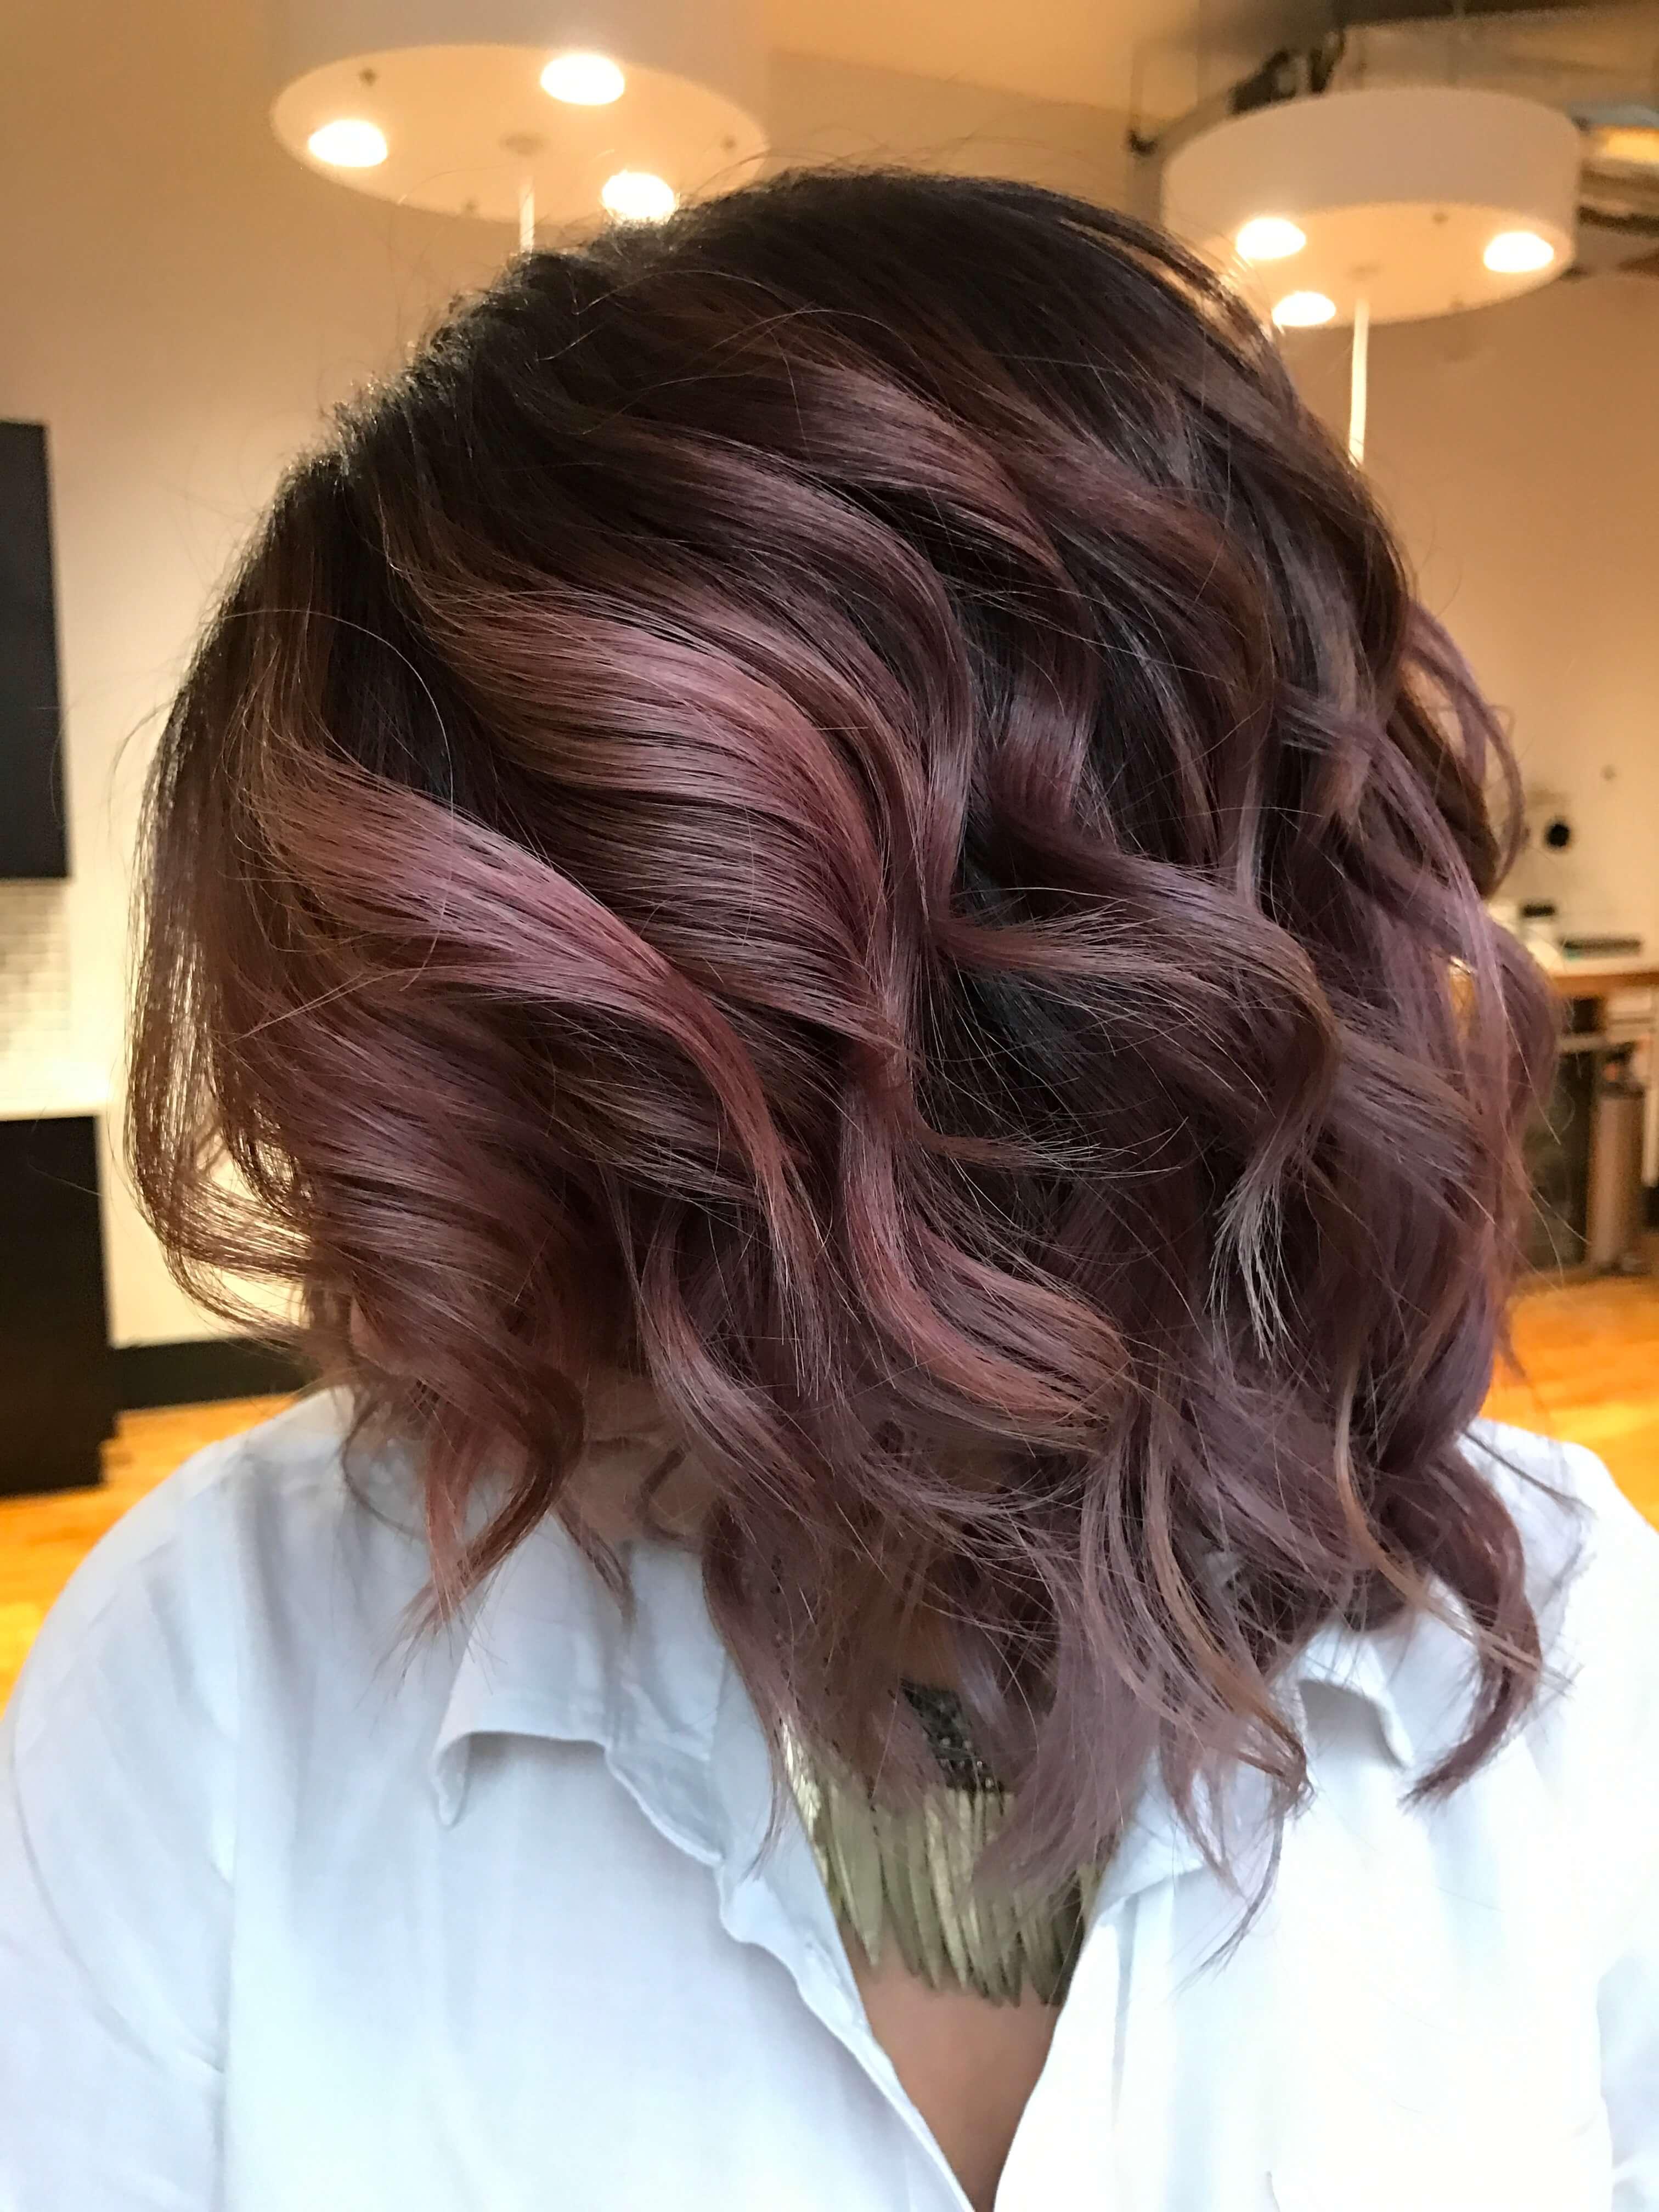 Dark Hair Color 8 Dark Winter Hues To Try